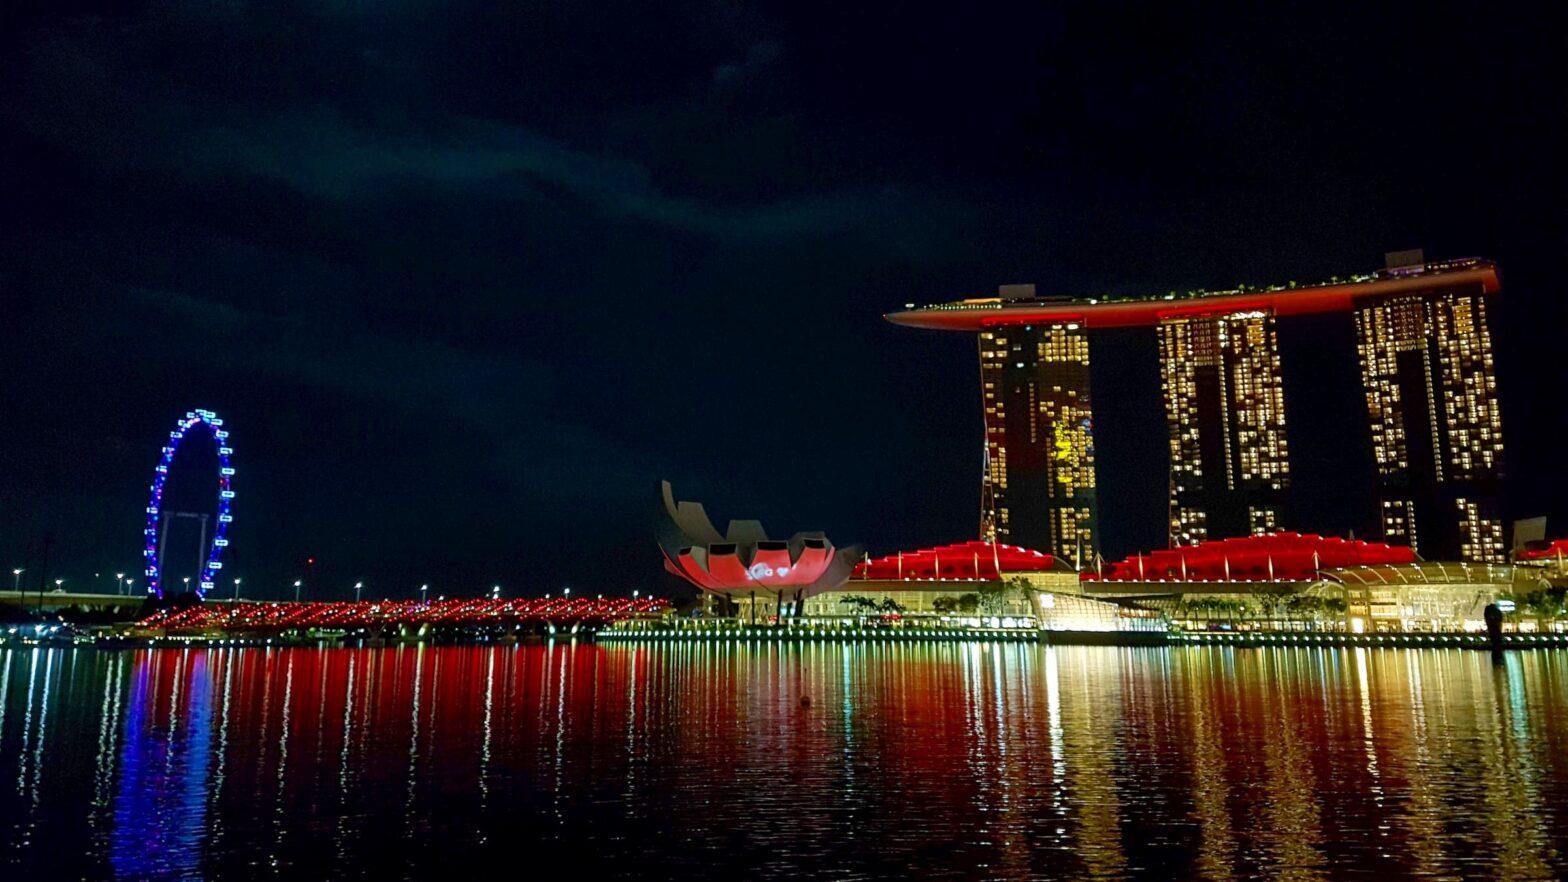 Marina Bay Sands area at night, 31 October 2020